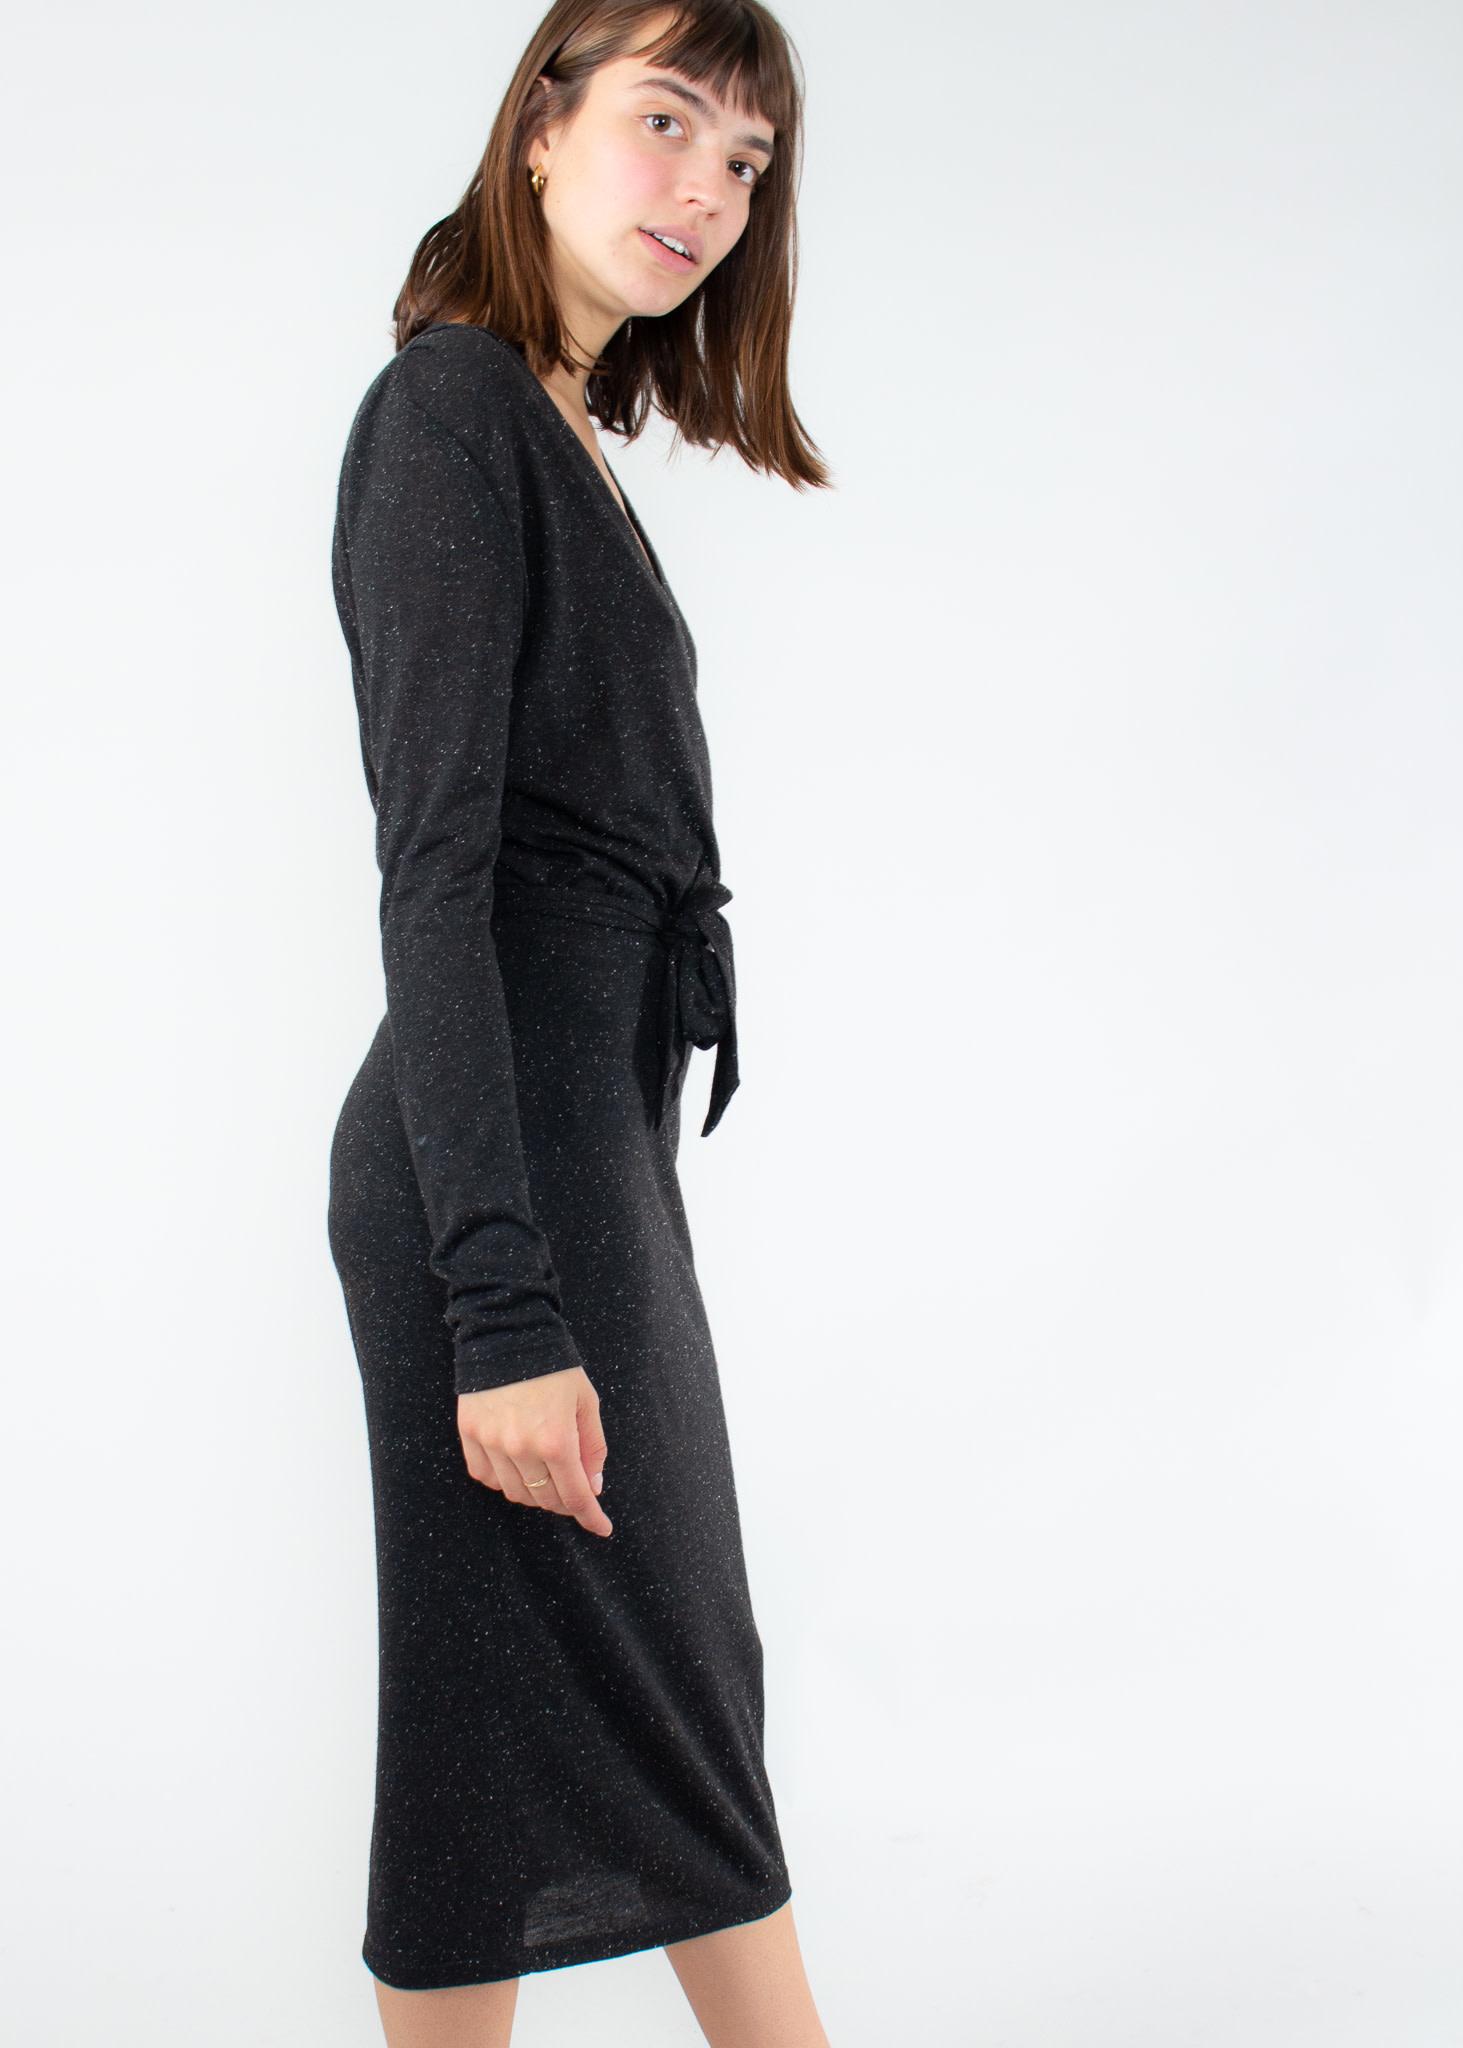 EVE GRAVEL Robe Mad Desire black jersey